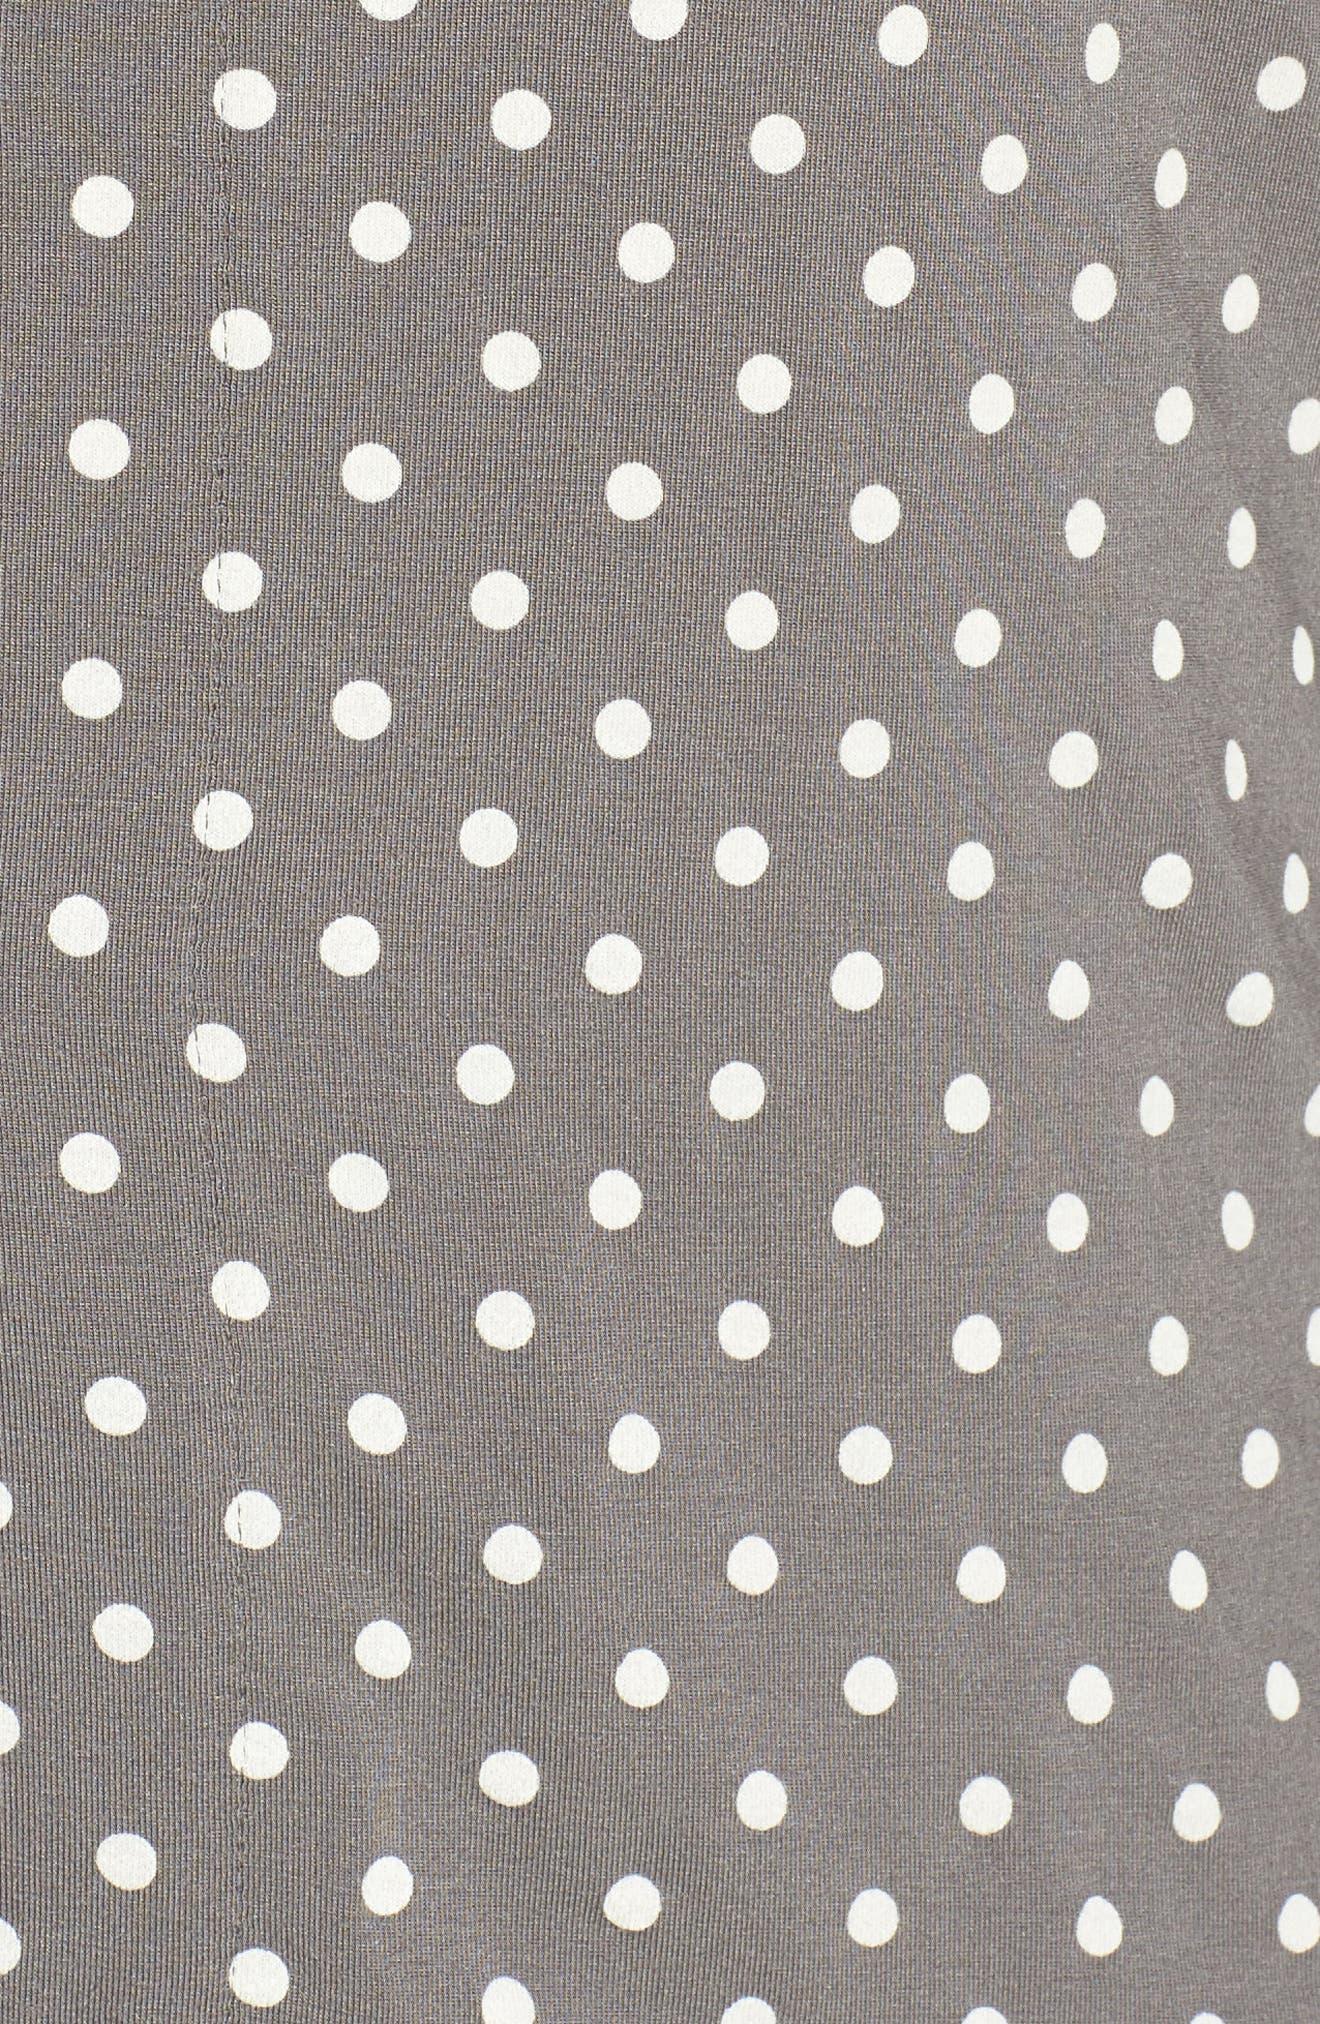 Polka Dot Pajamas,                             Alternate thumbnail 6, color,                             Charcoal